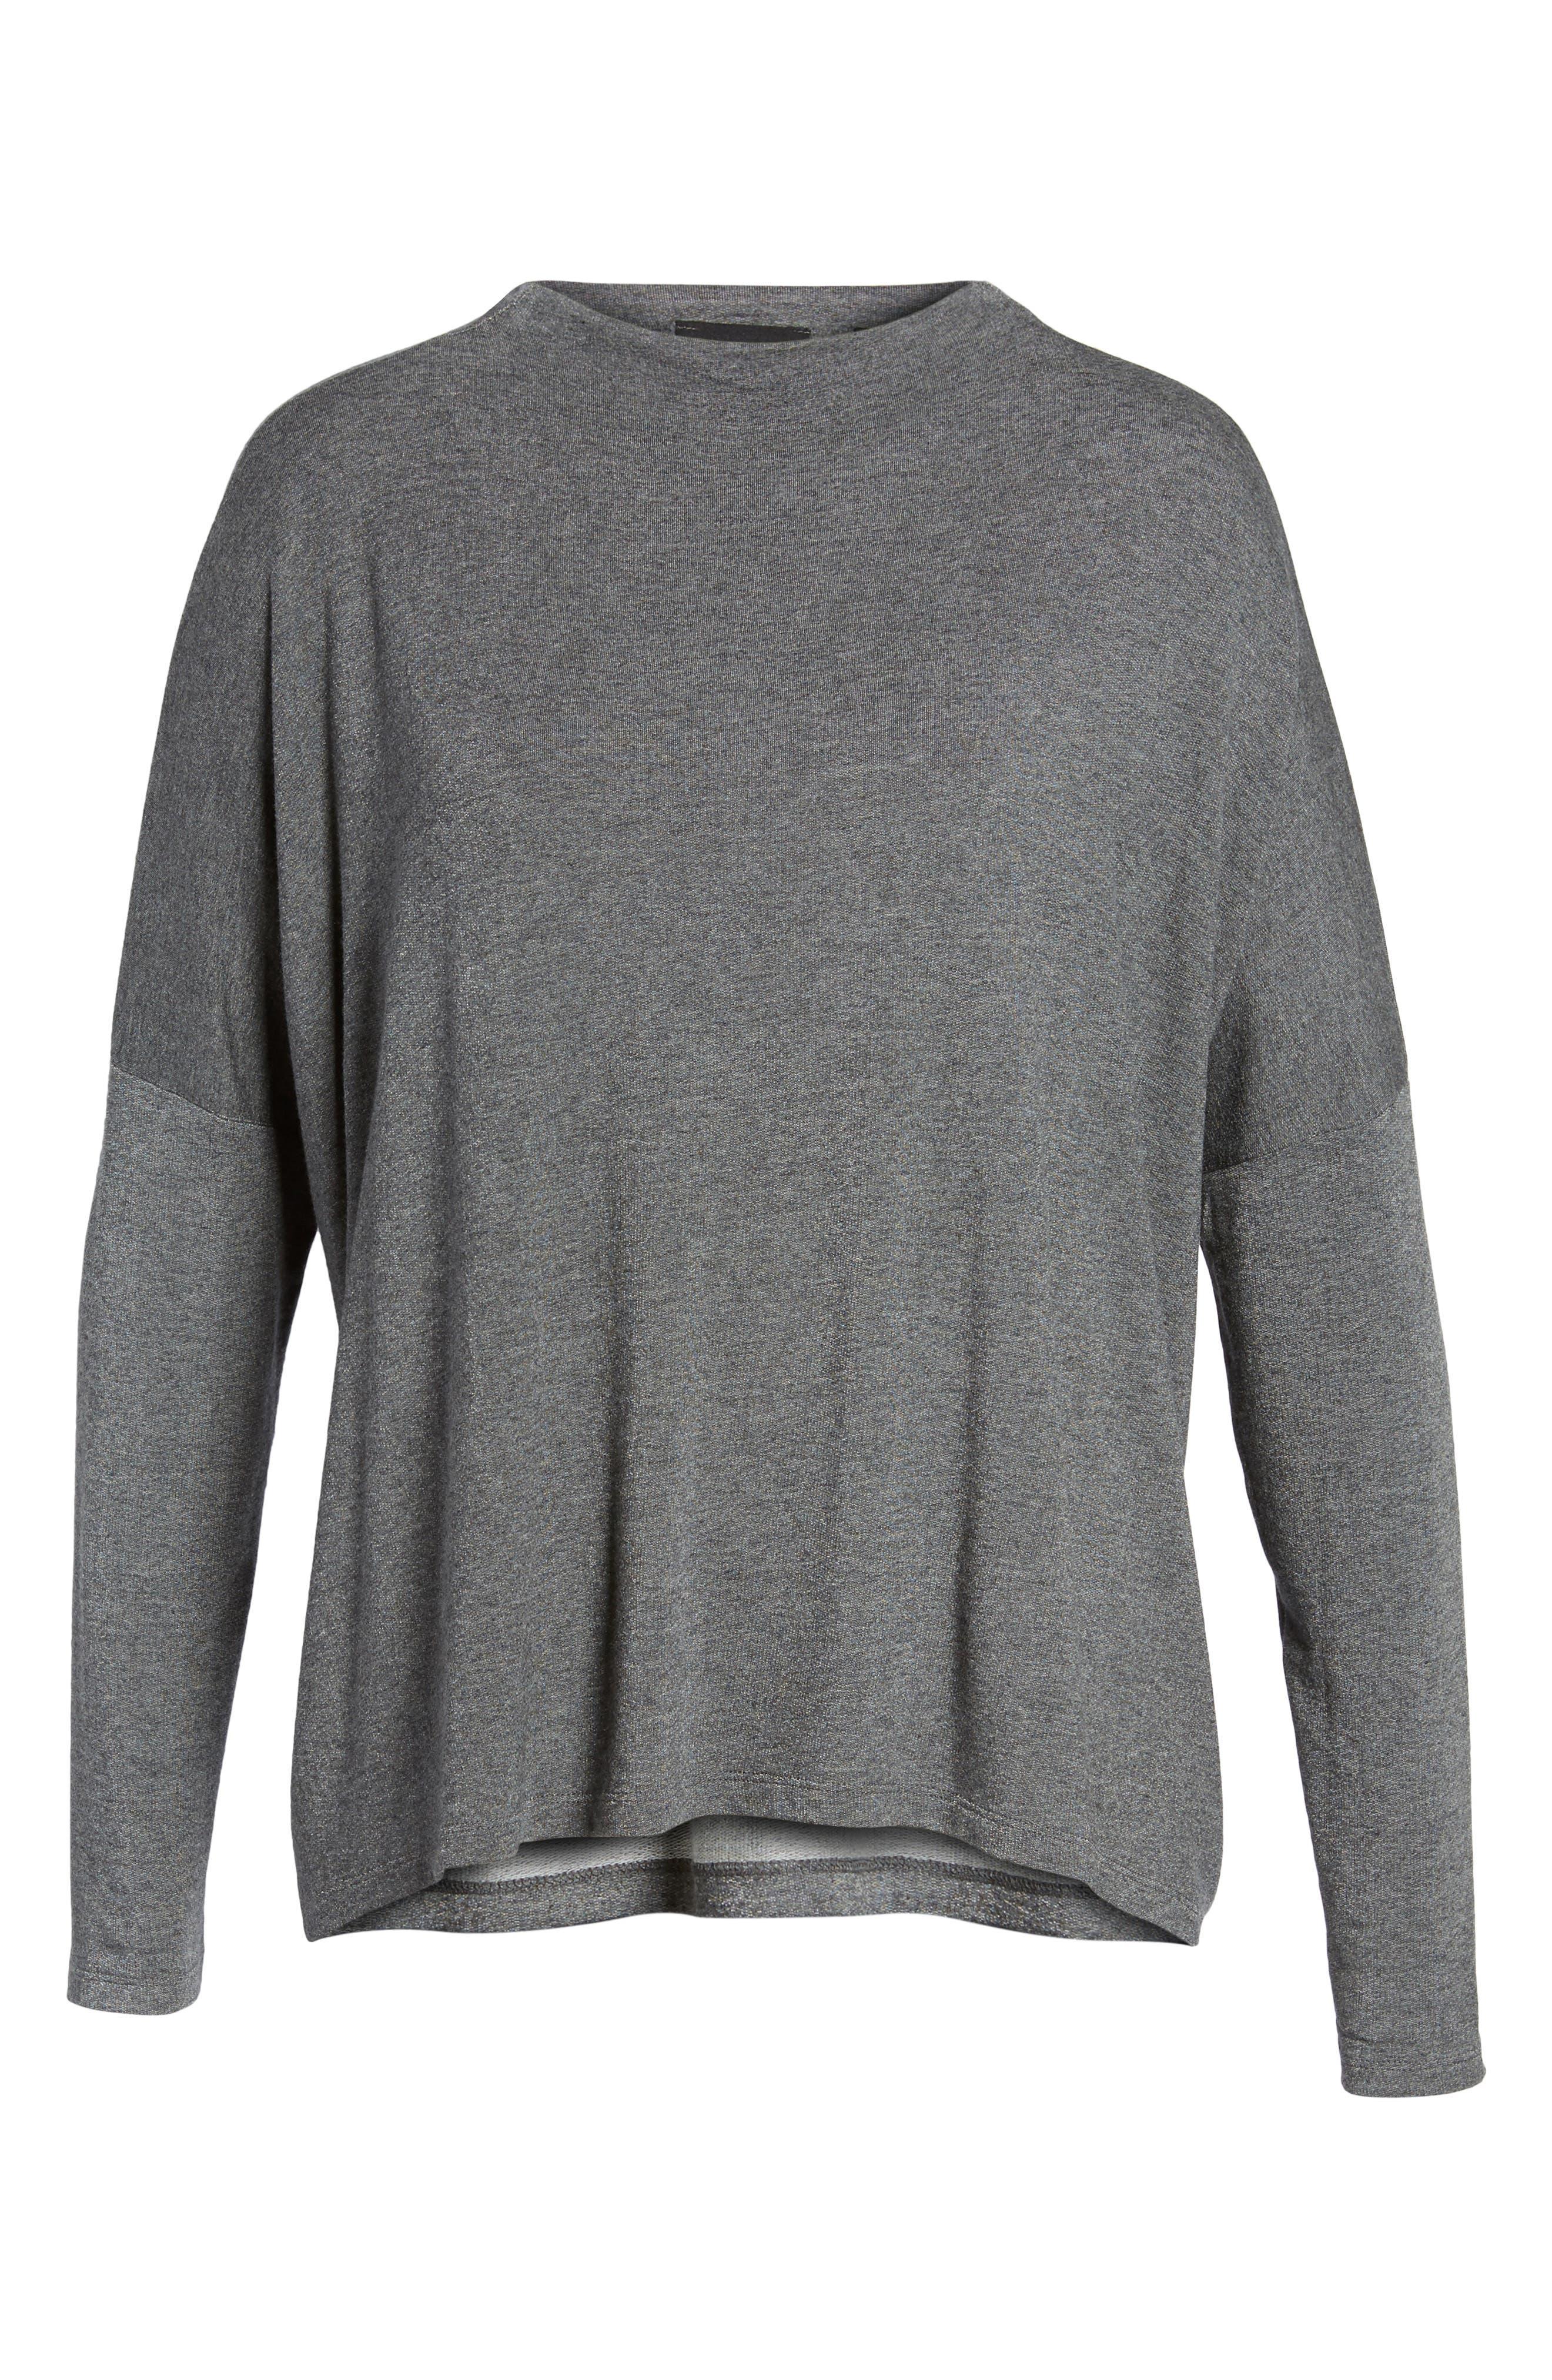 High Neck Sweatshirt,                         Main,                         color, Charcoal Mix